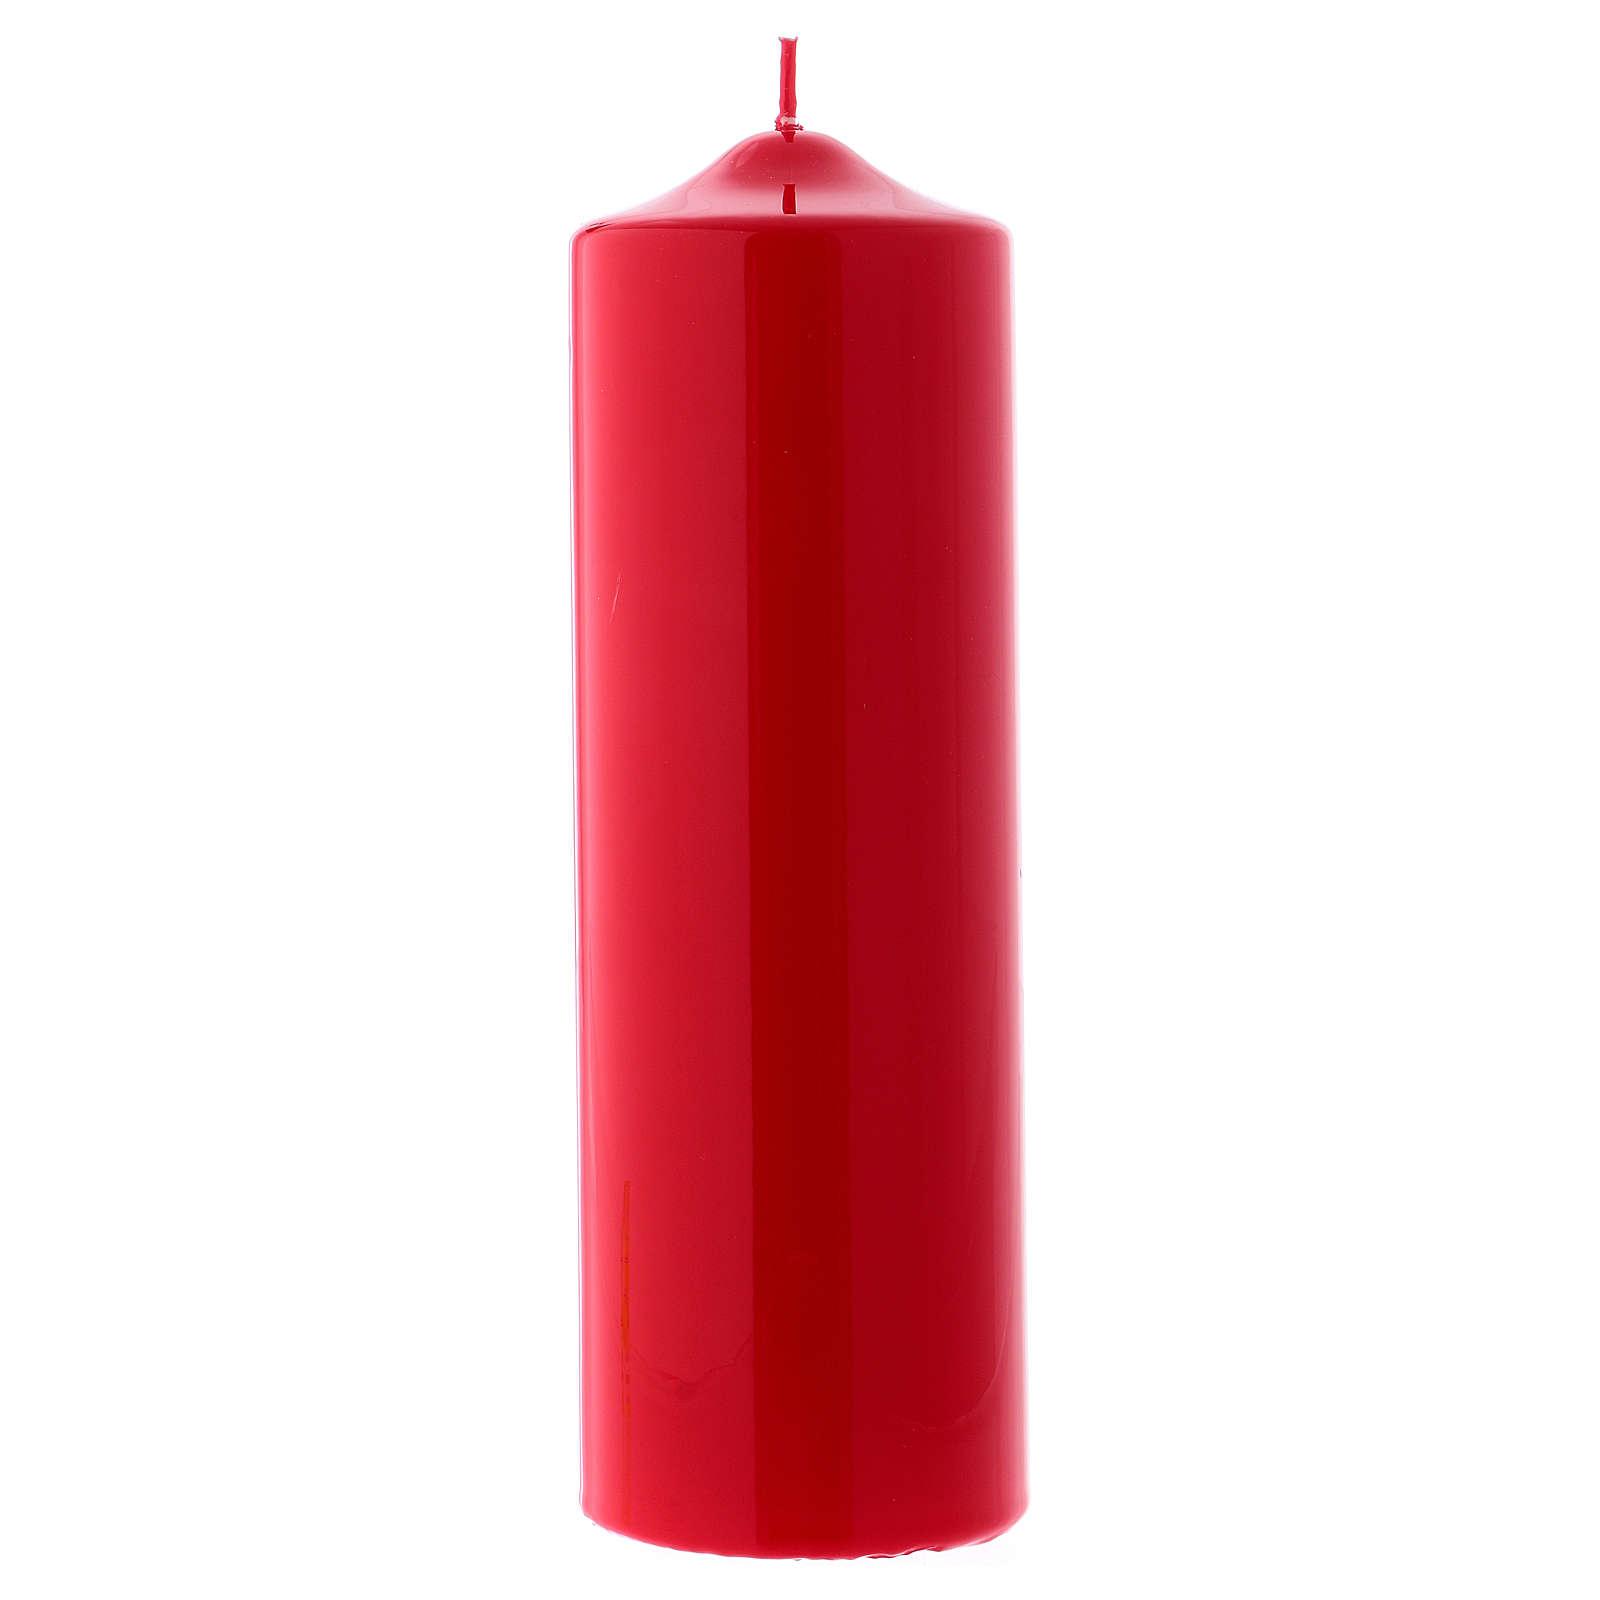 Bougie liturgique cire brillante Ceralacca 24x8 cm rouge 3